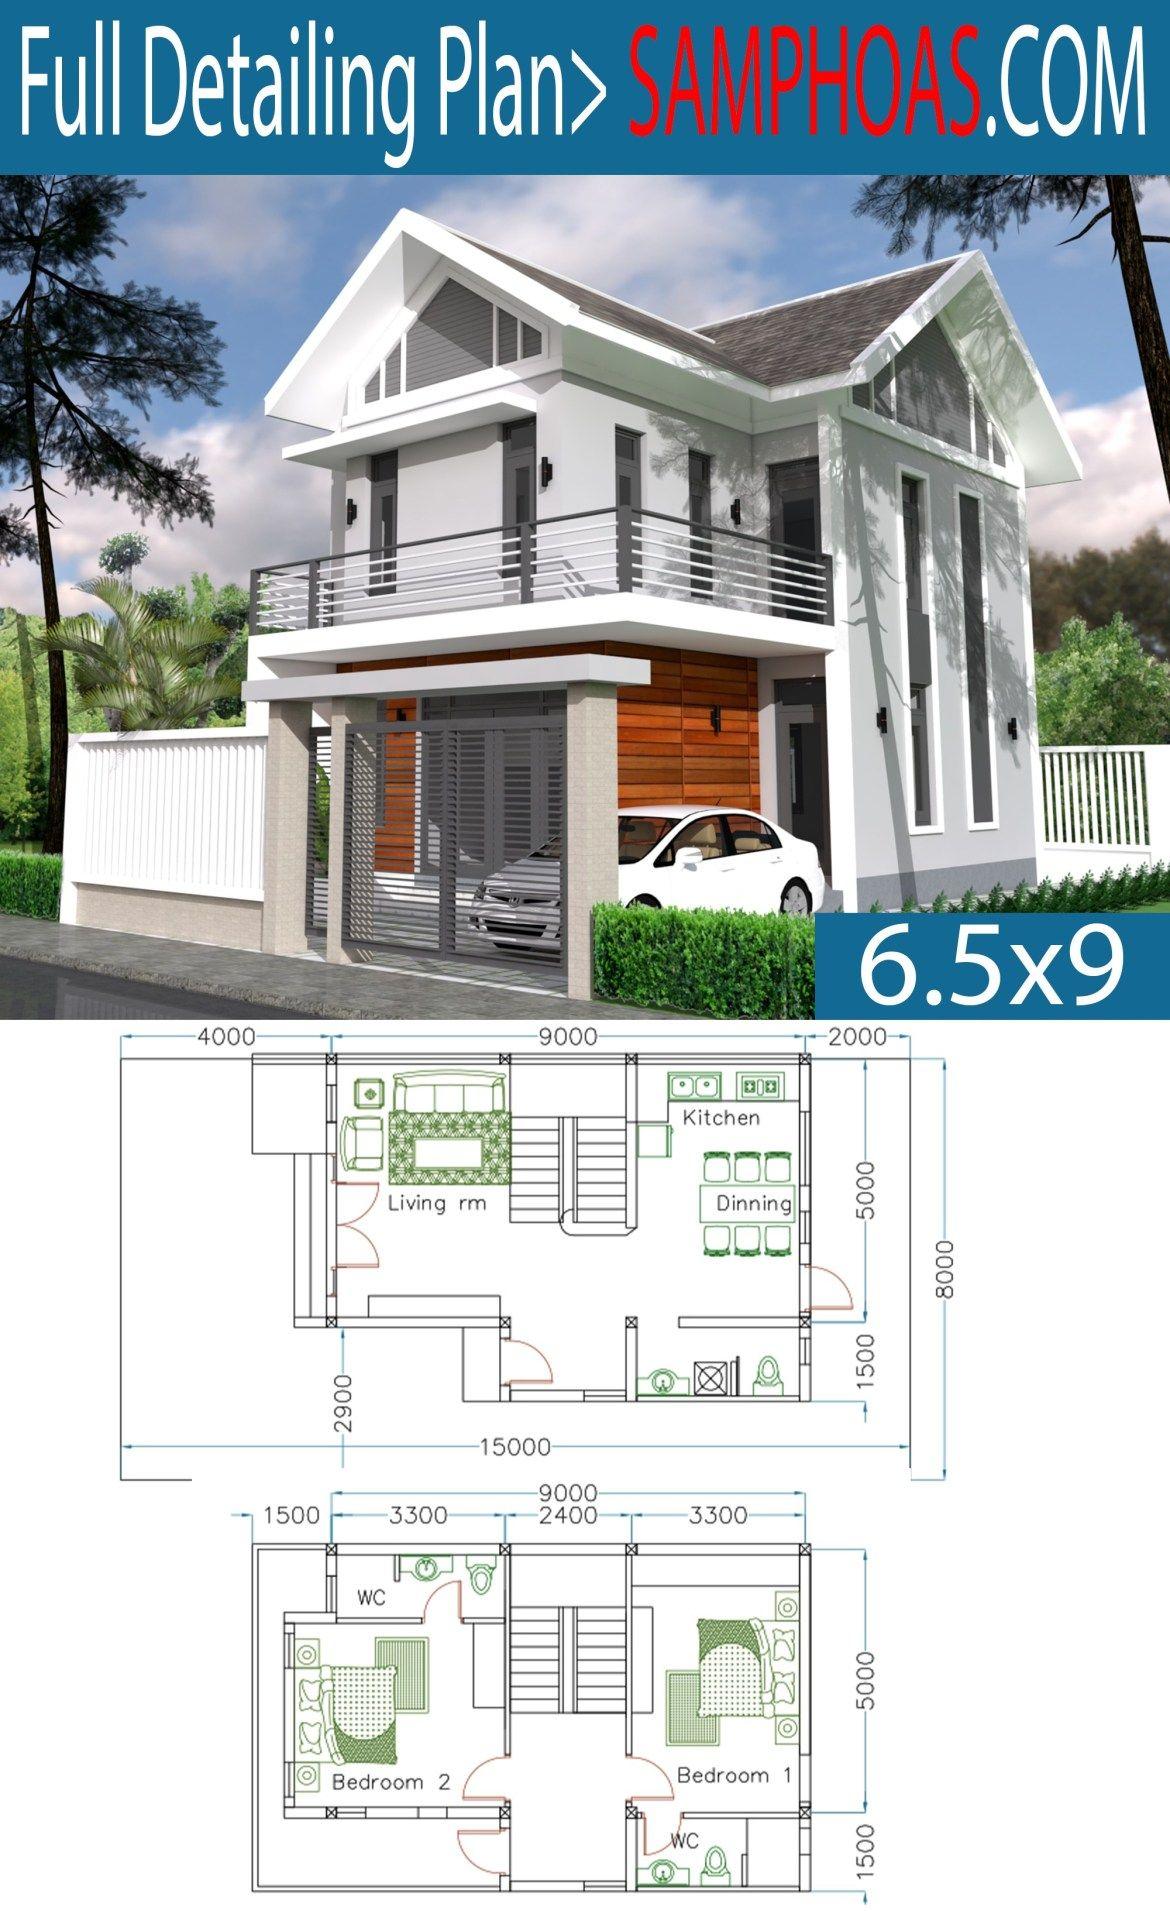 Home Design Plan 6 5x9m With 2 Bedrooms Samphoas Plansearch Home Design Plan House Design Simple House Design